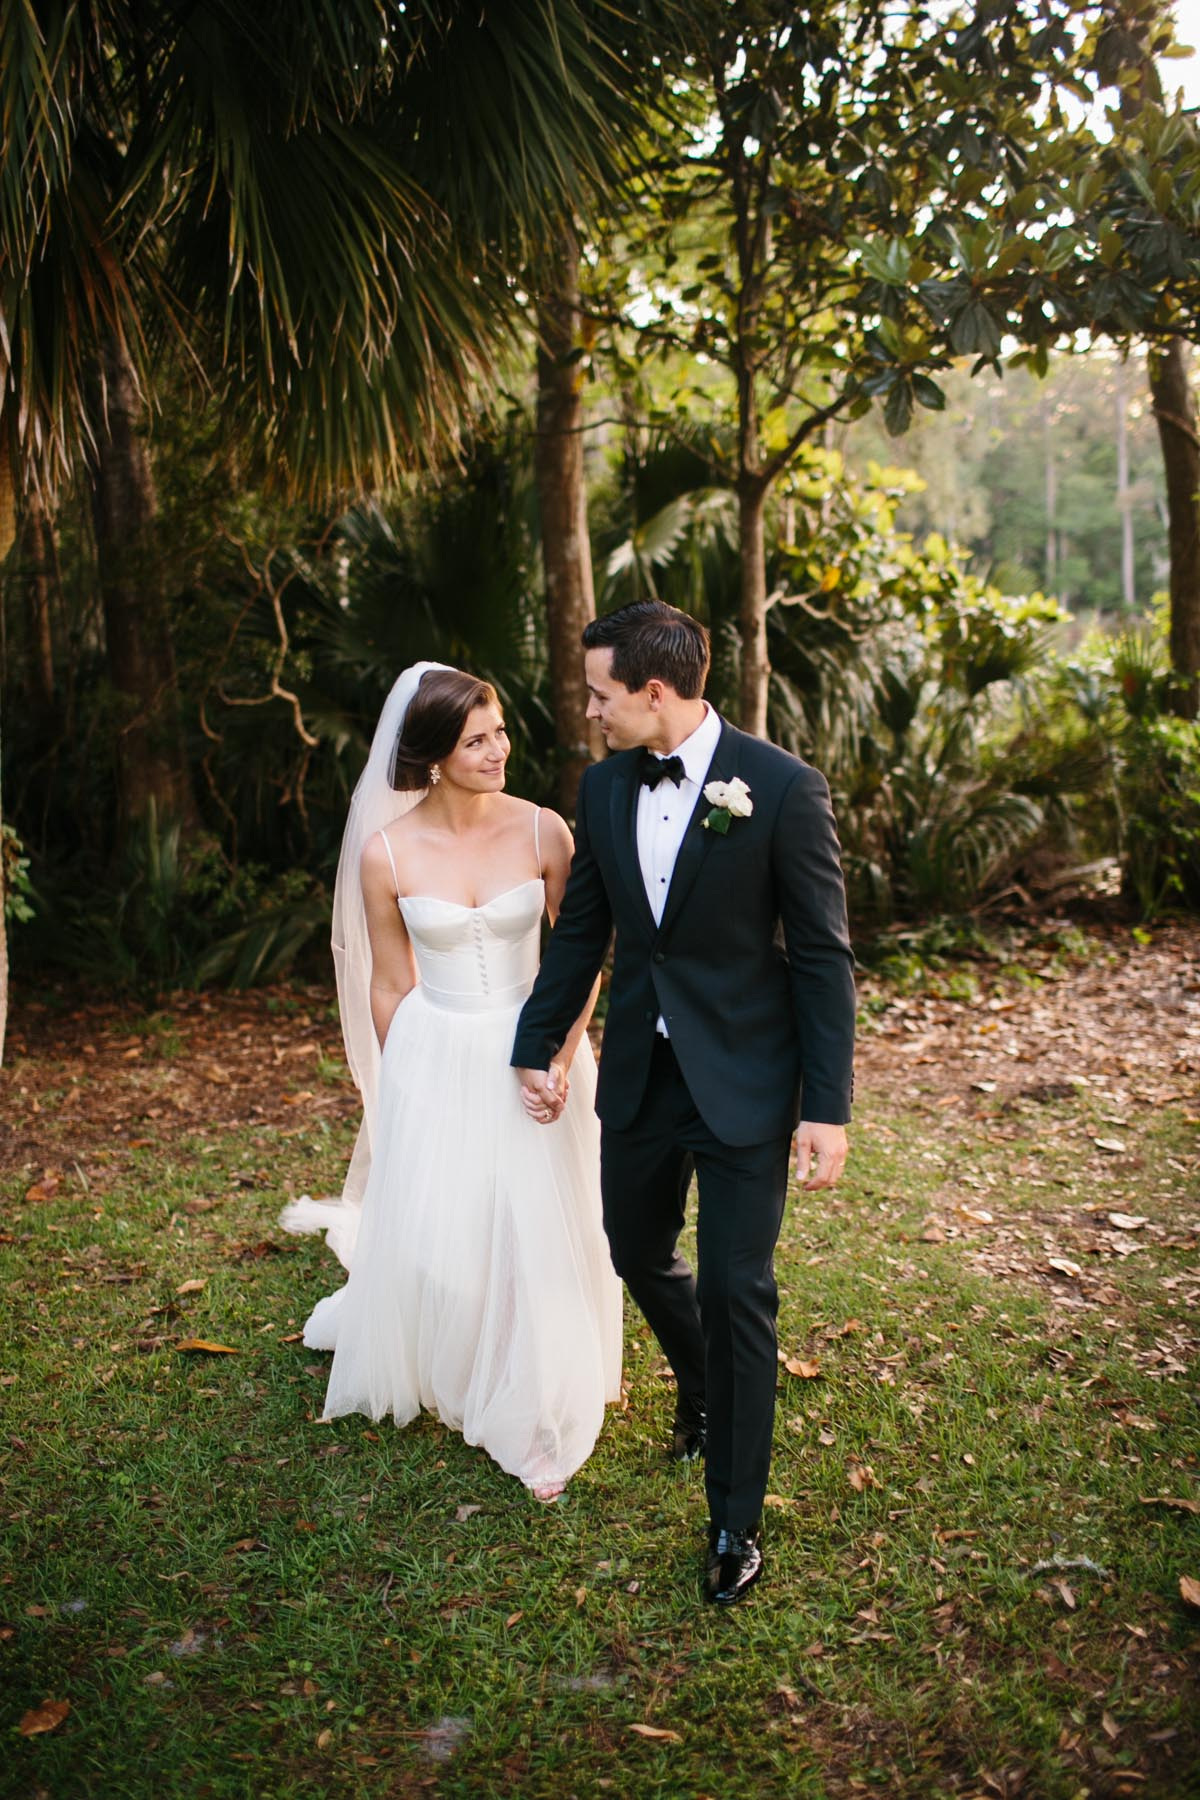 lowry wedding blog eden garden florida wedding-105